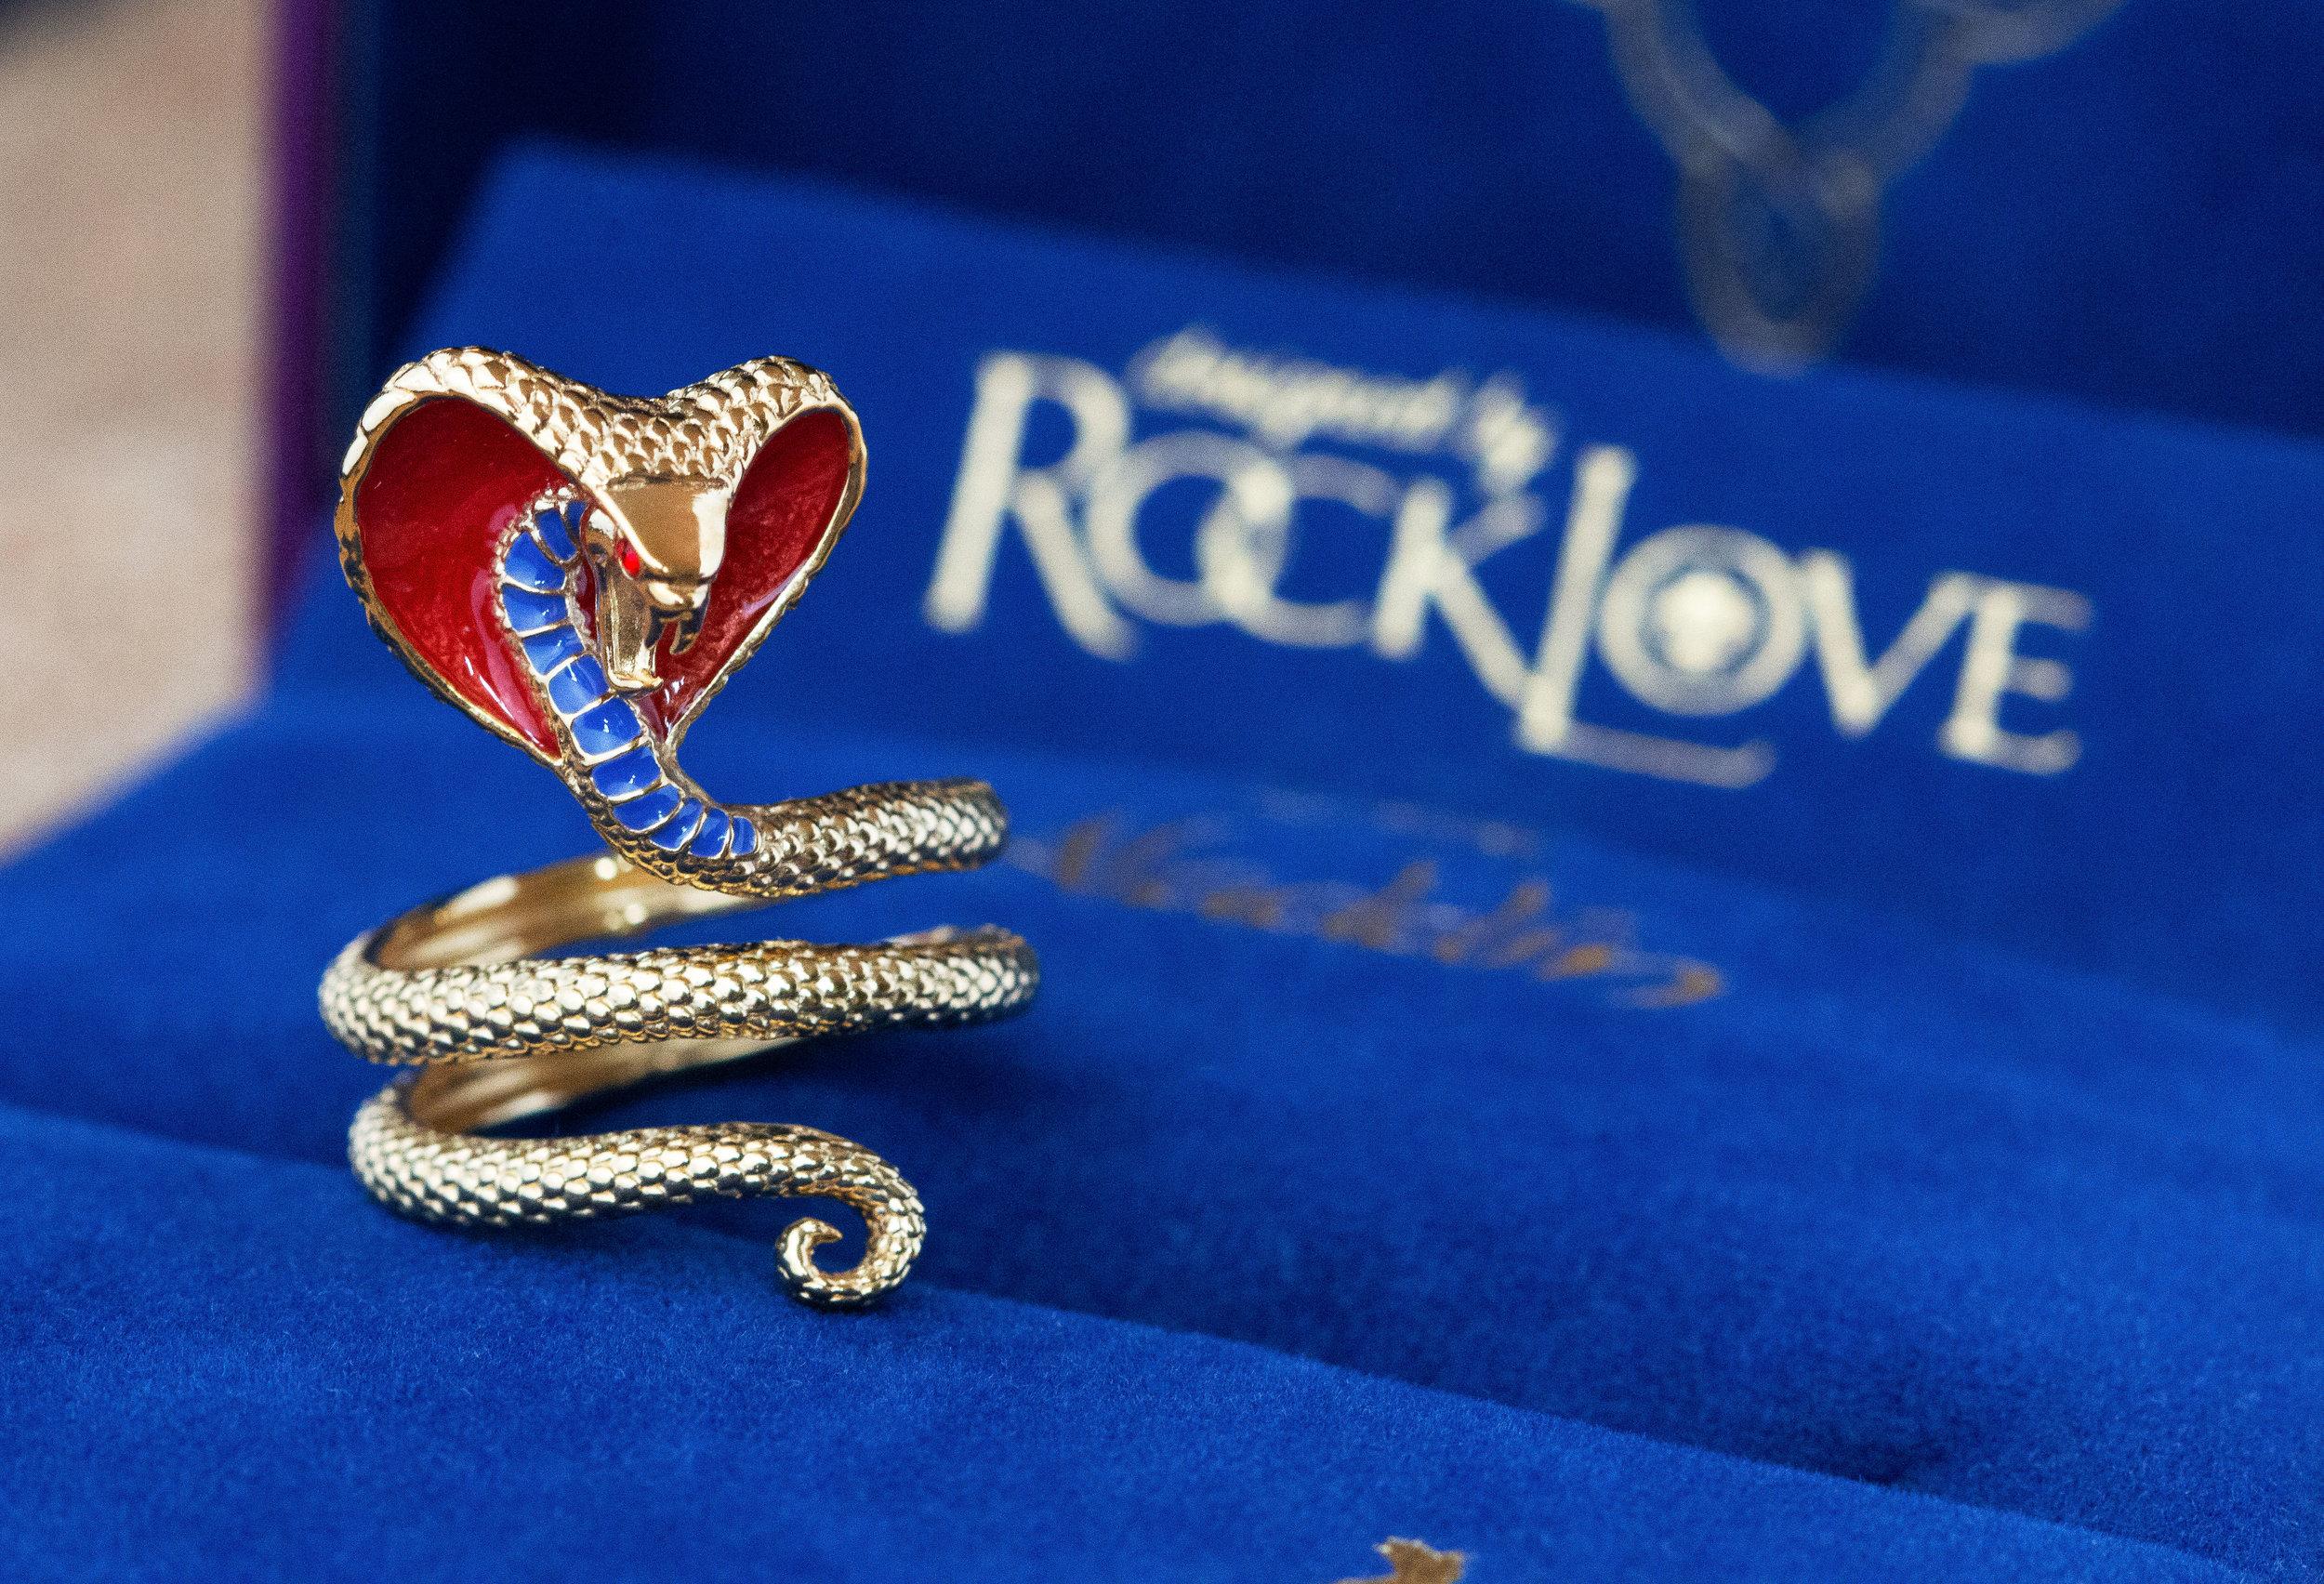 Photo credit: RockLove Jewelry